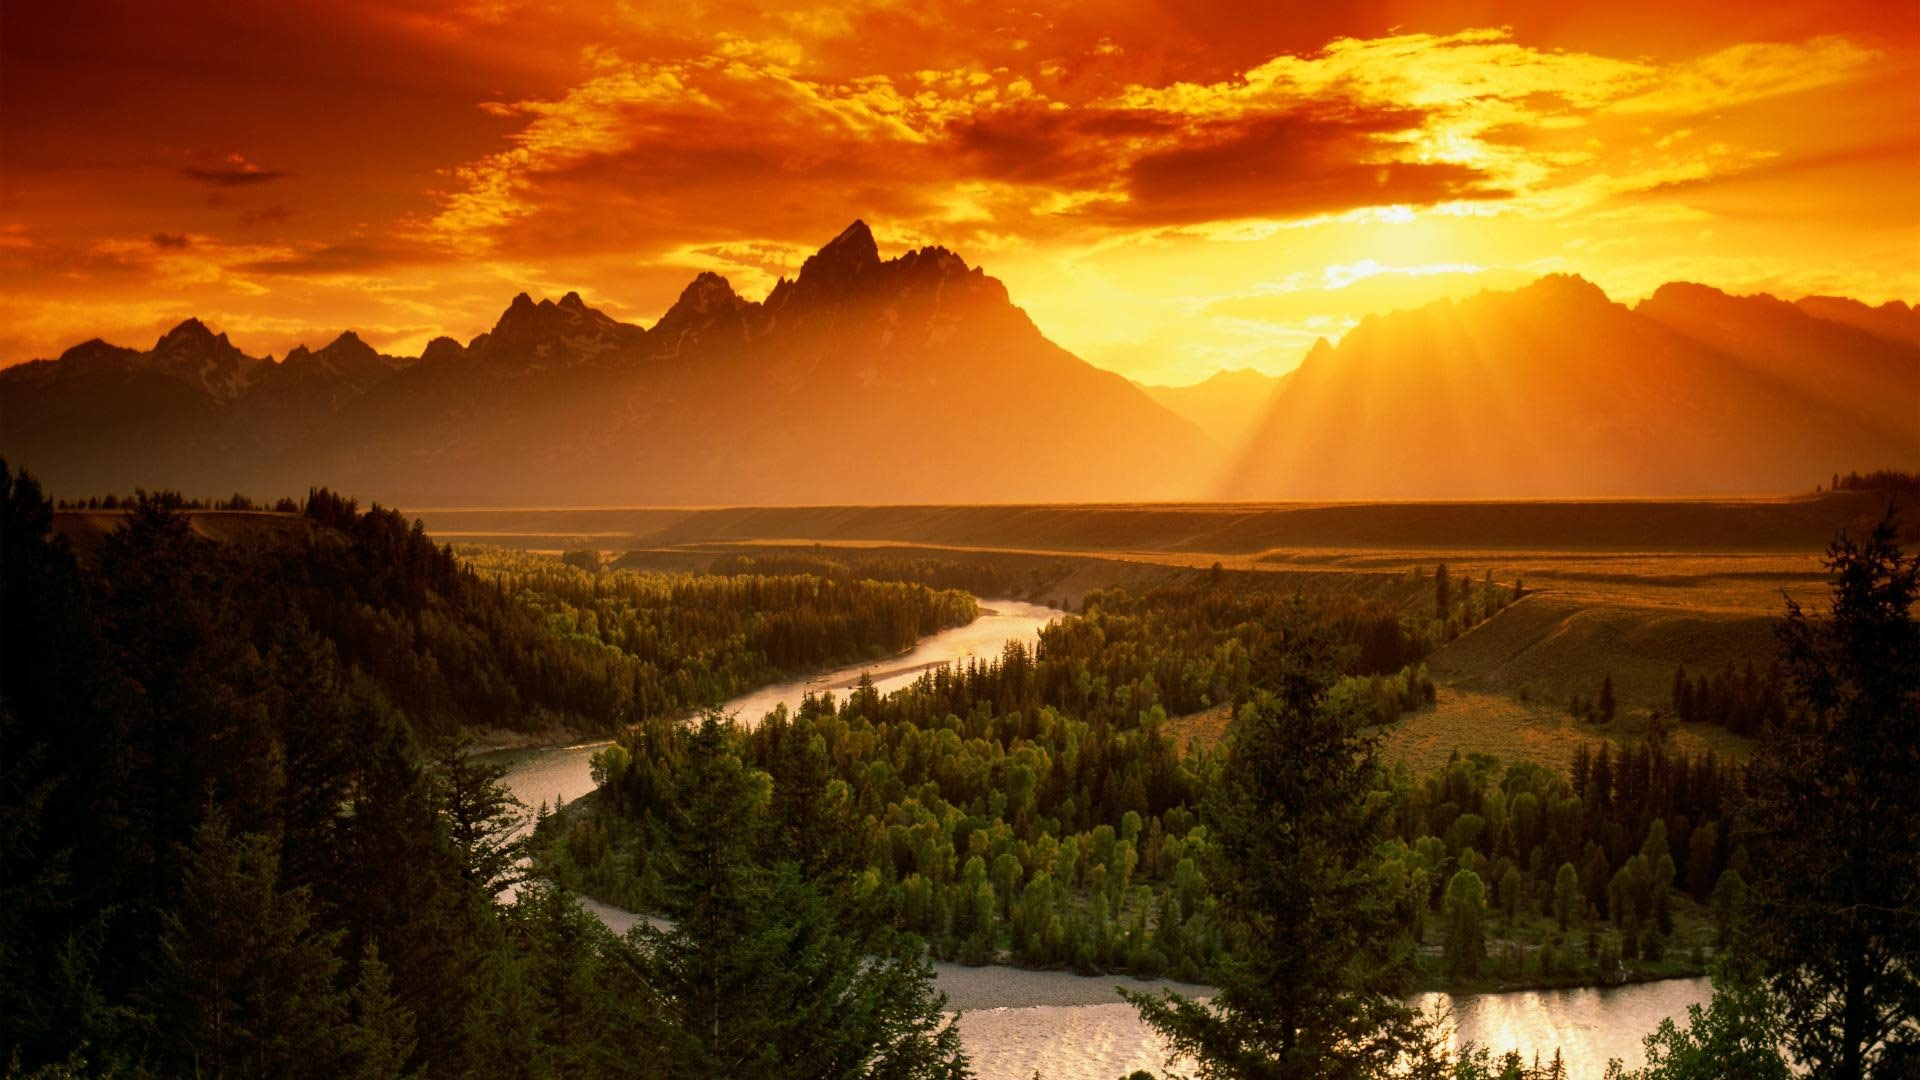 Landscape Beautiful Wallpaper